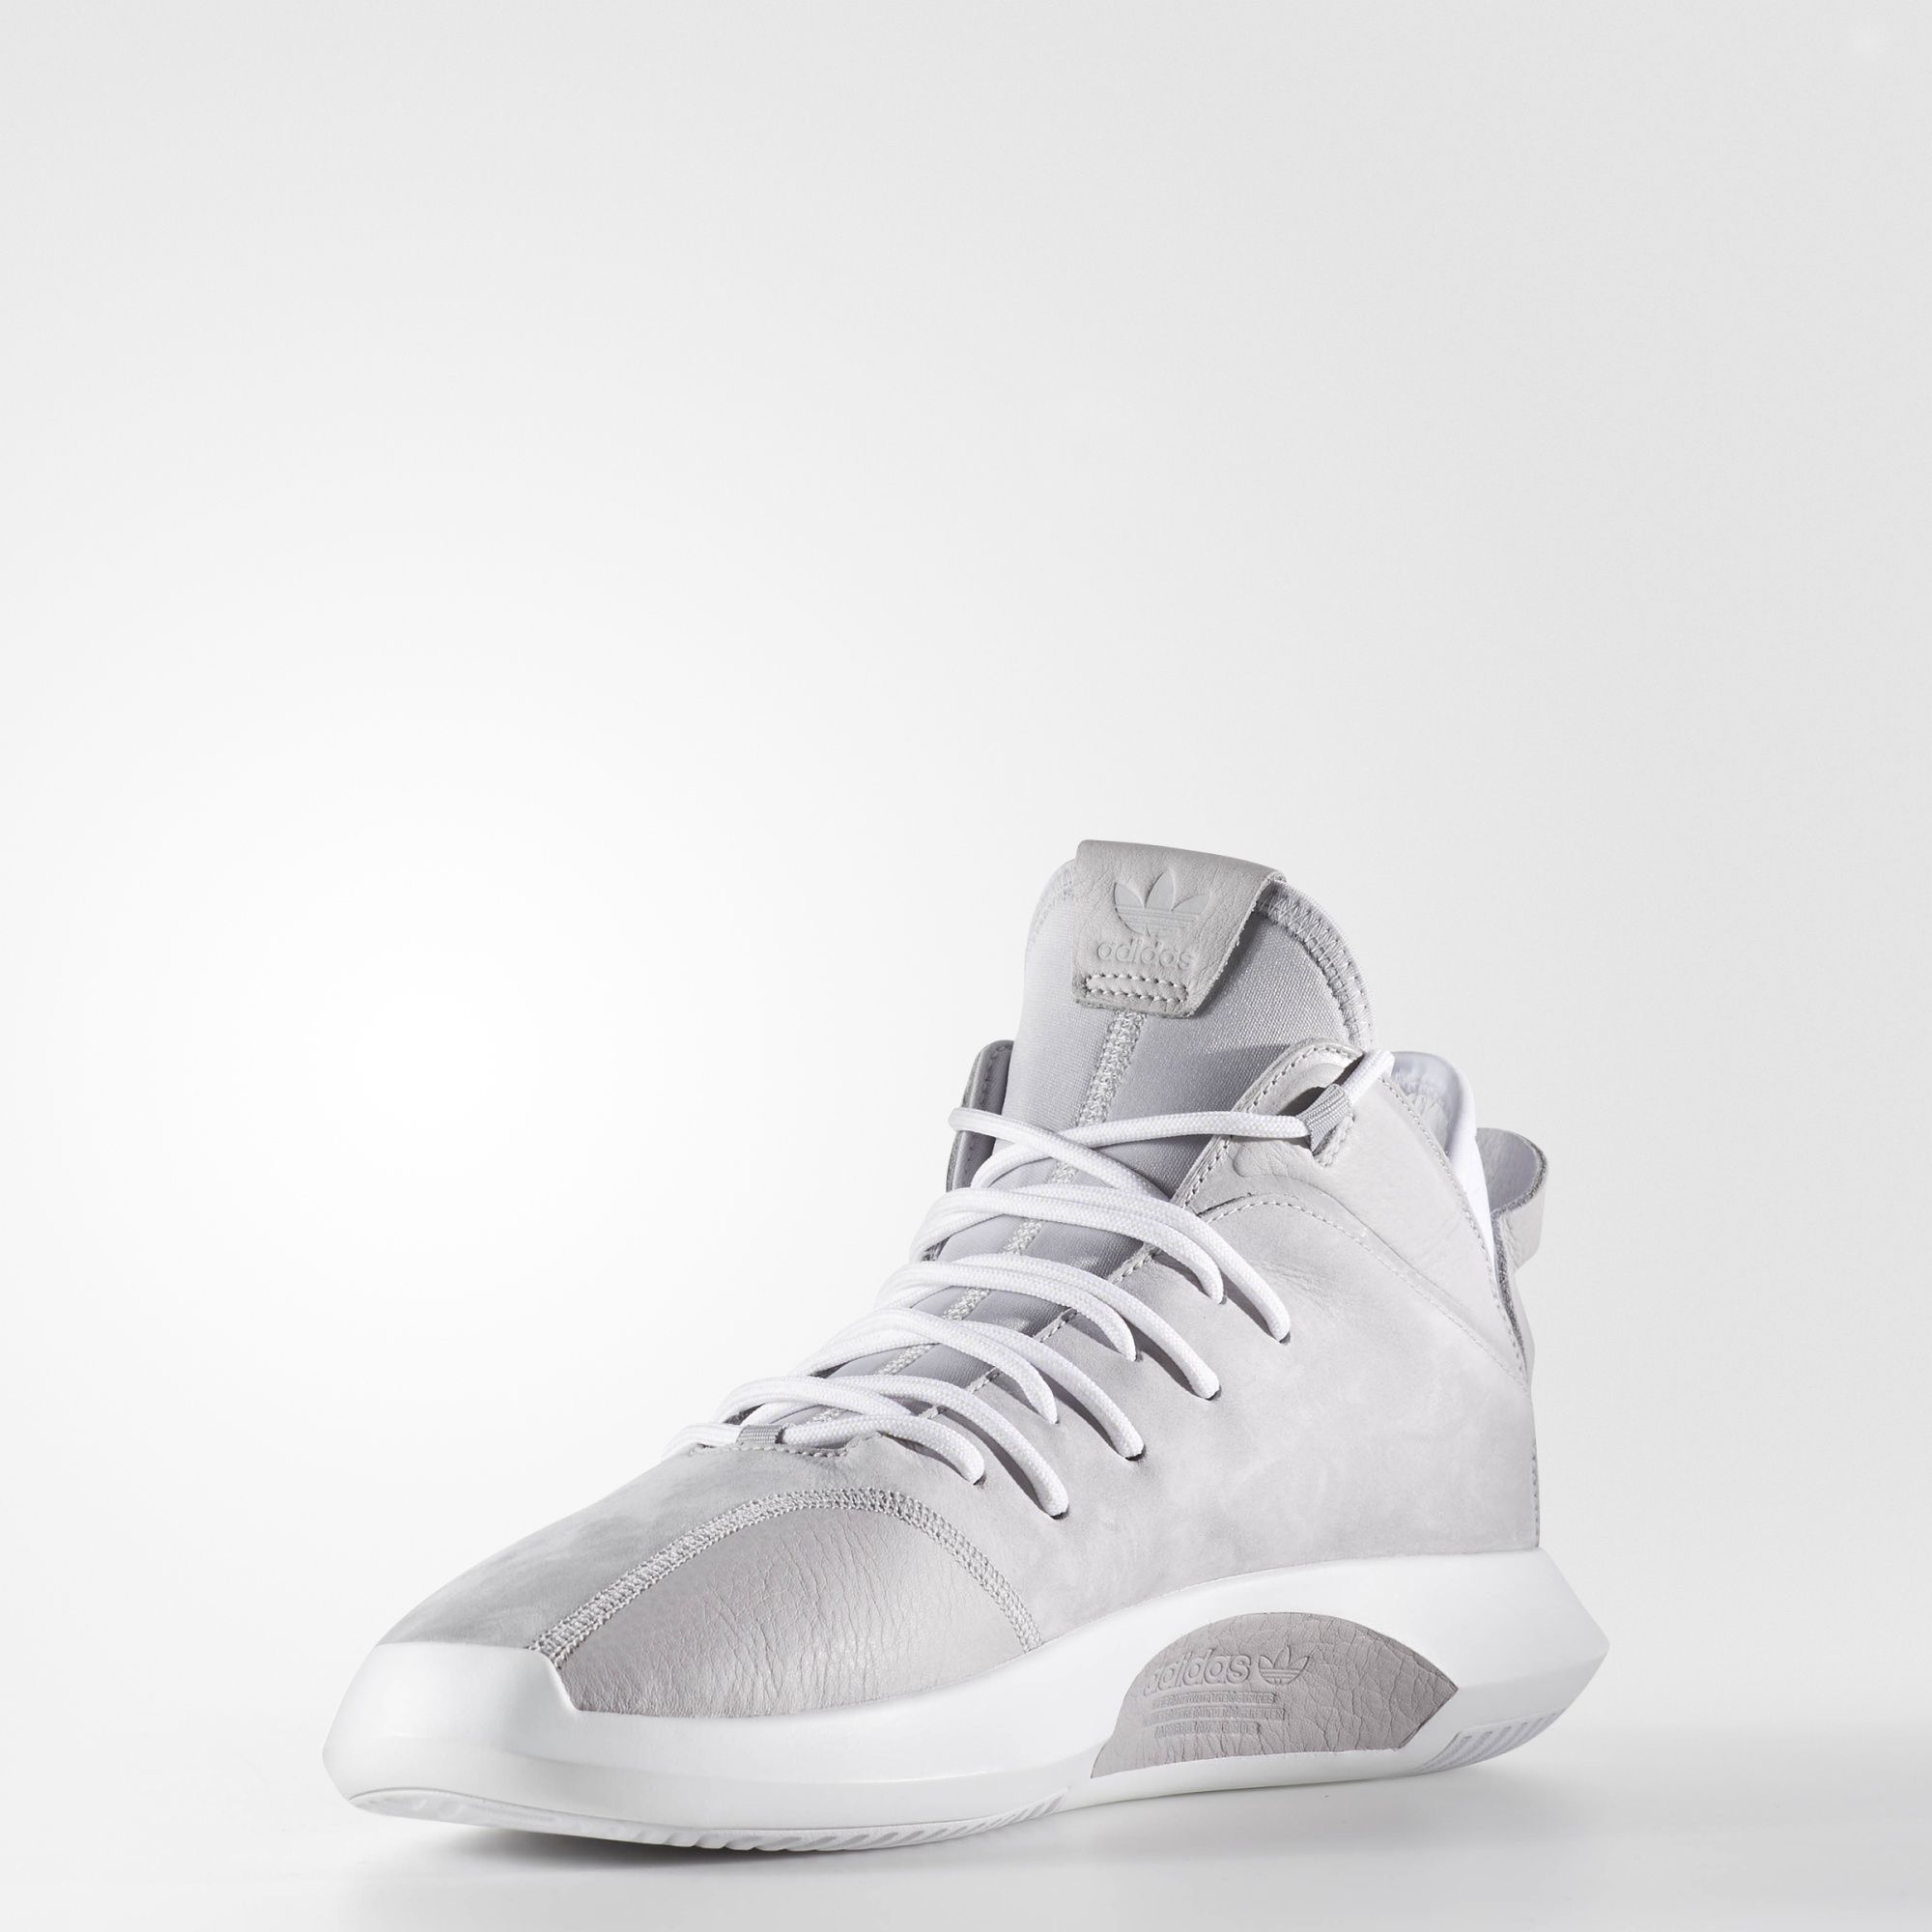 reputable site d4643 d083c adidas Originals Crazy 1 ADV